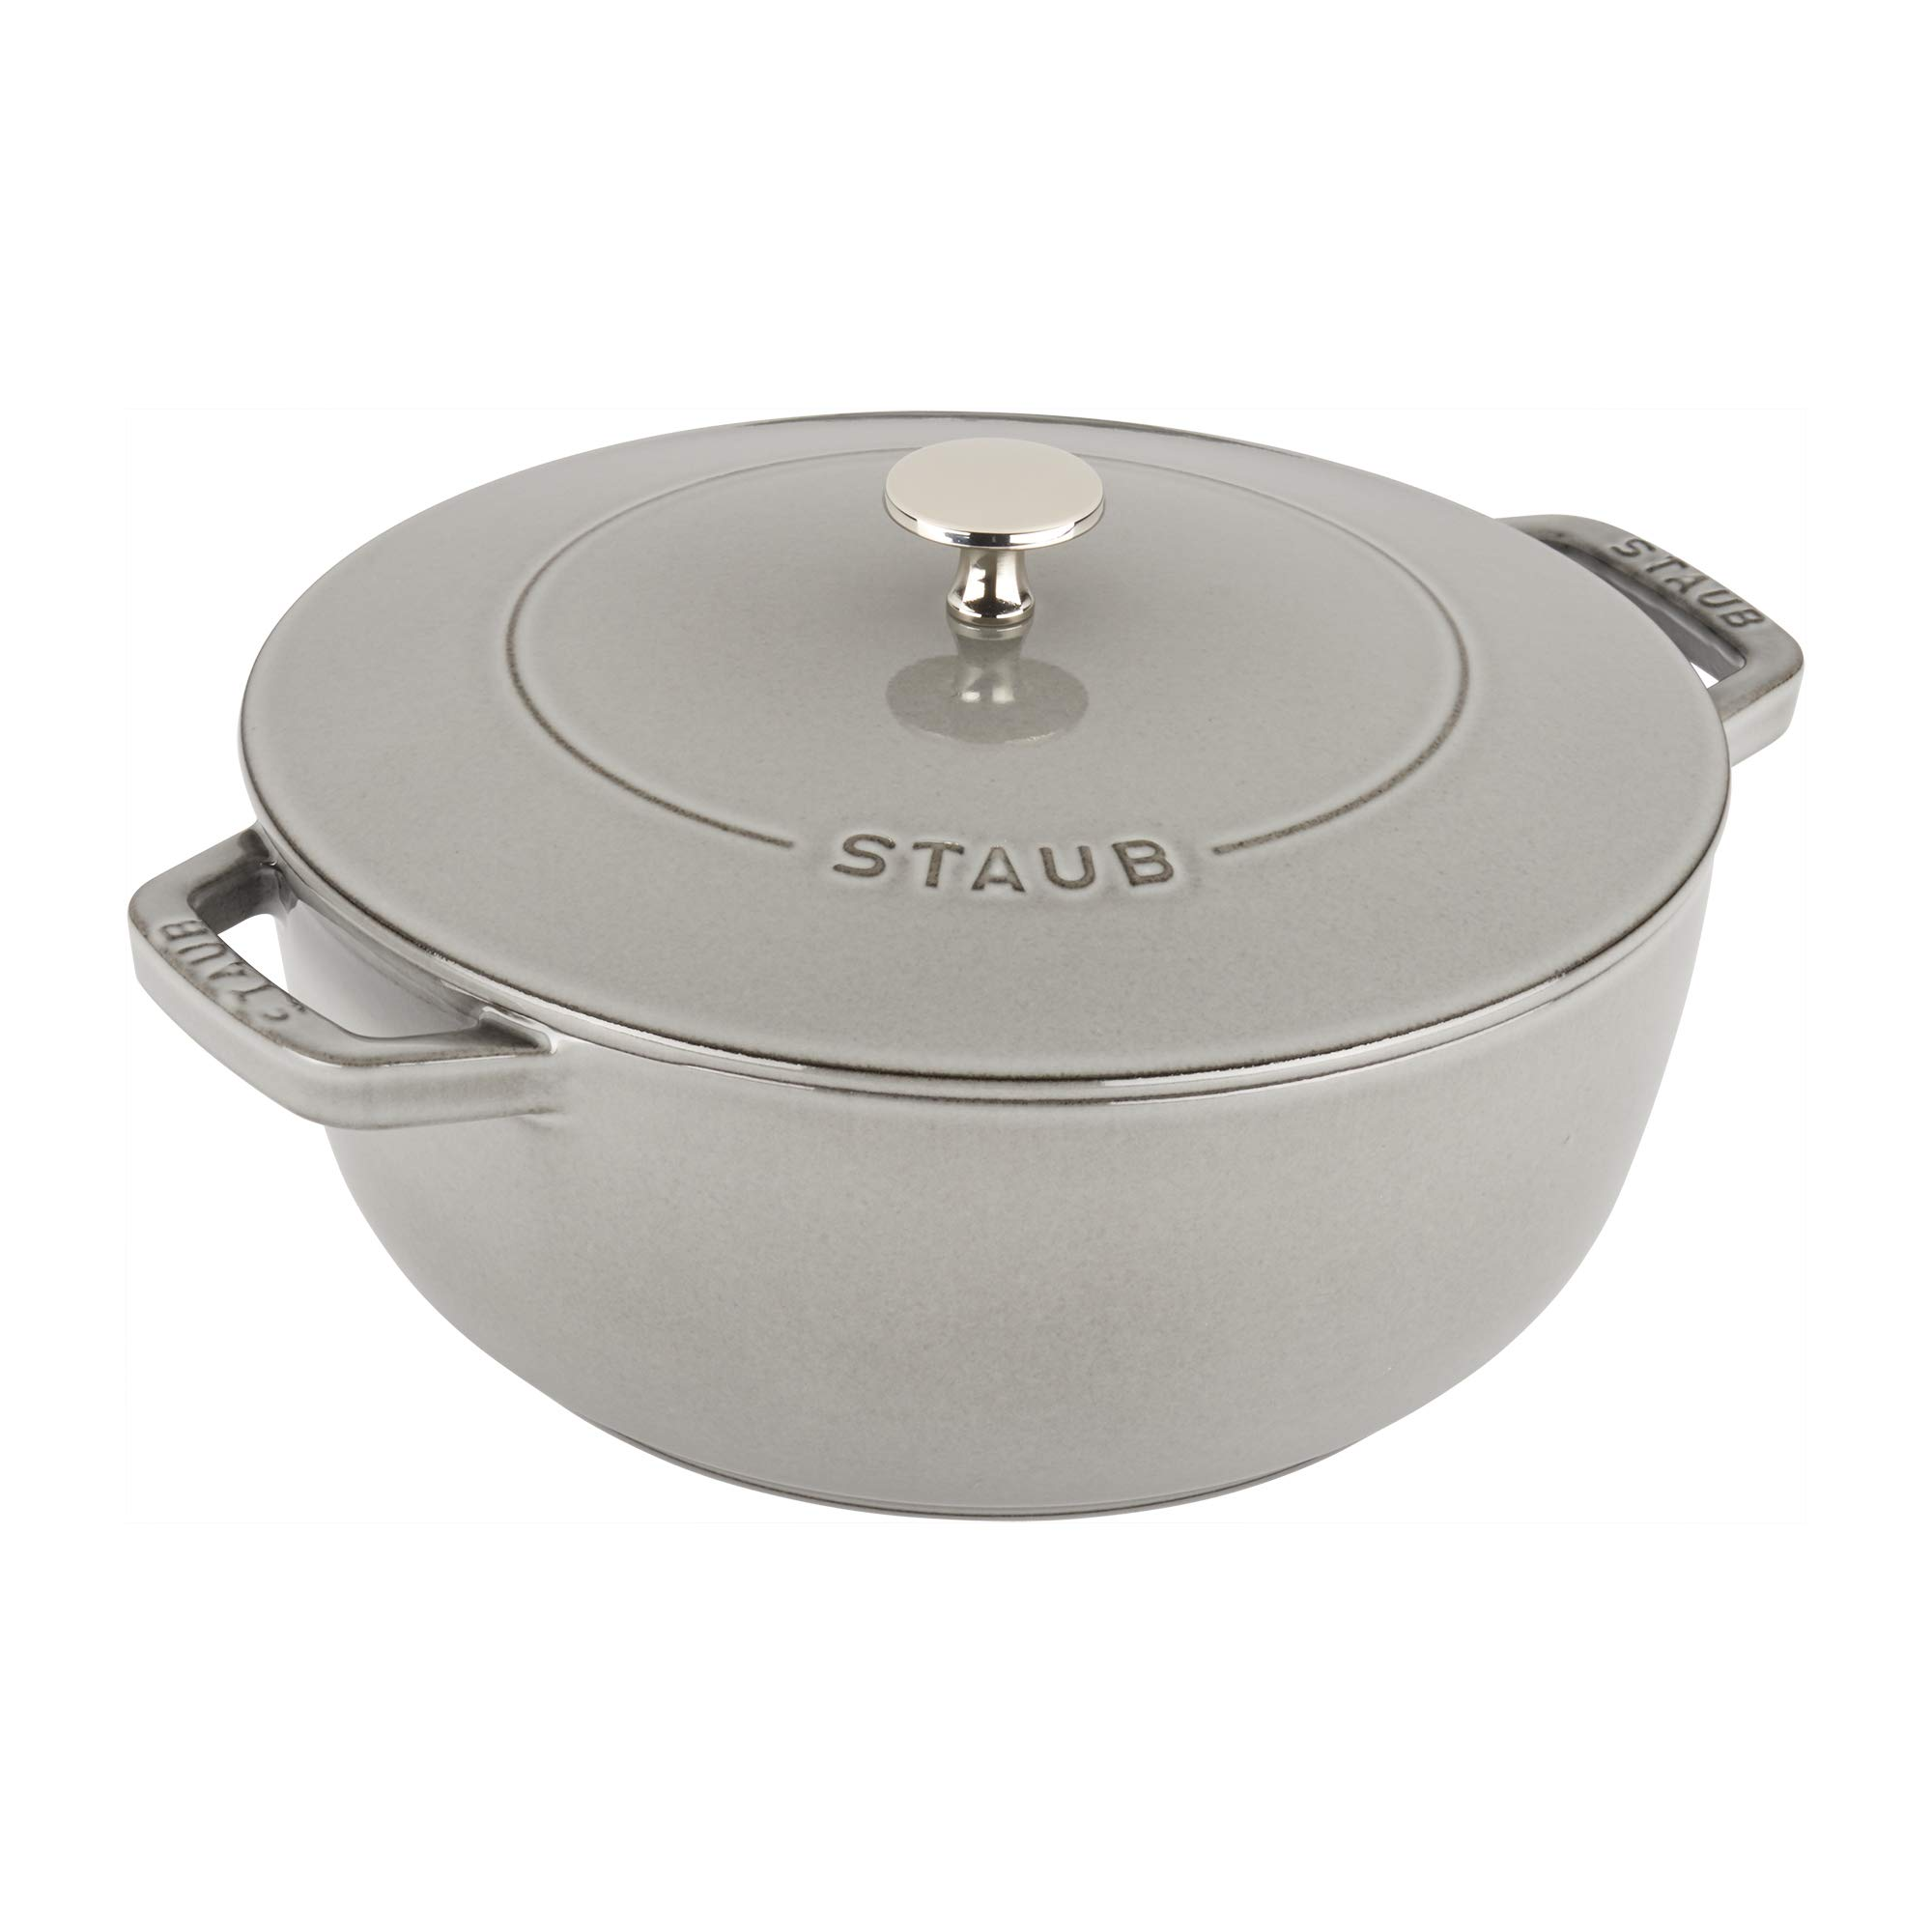 Staub Cast Iron 3.75-qt Essential French Oven - Graphite Grey